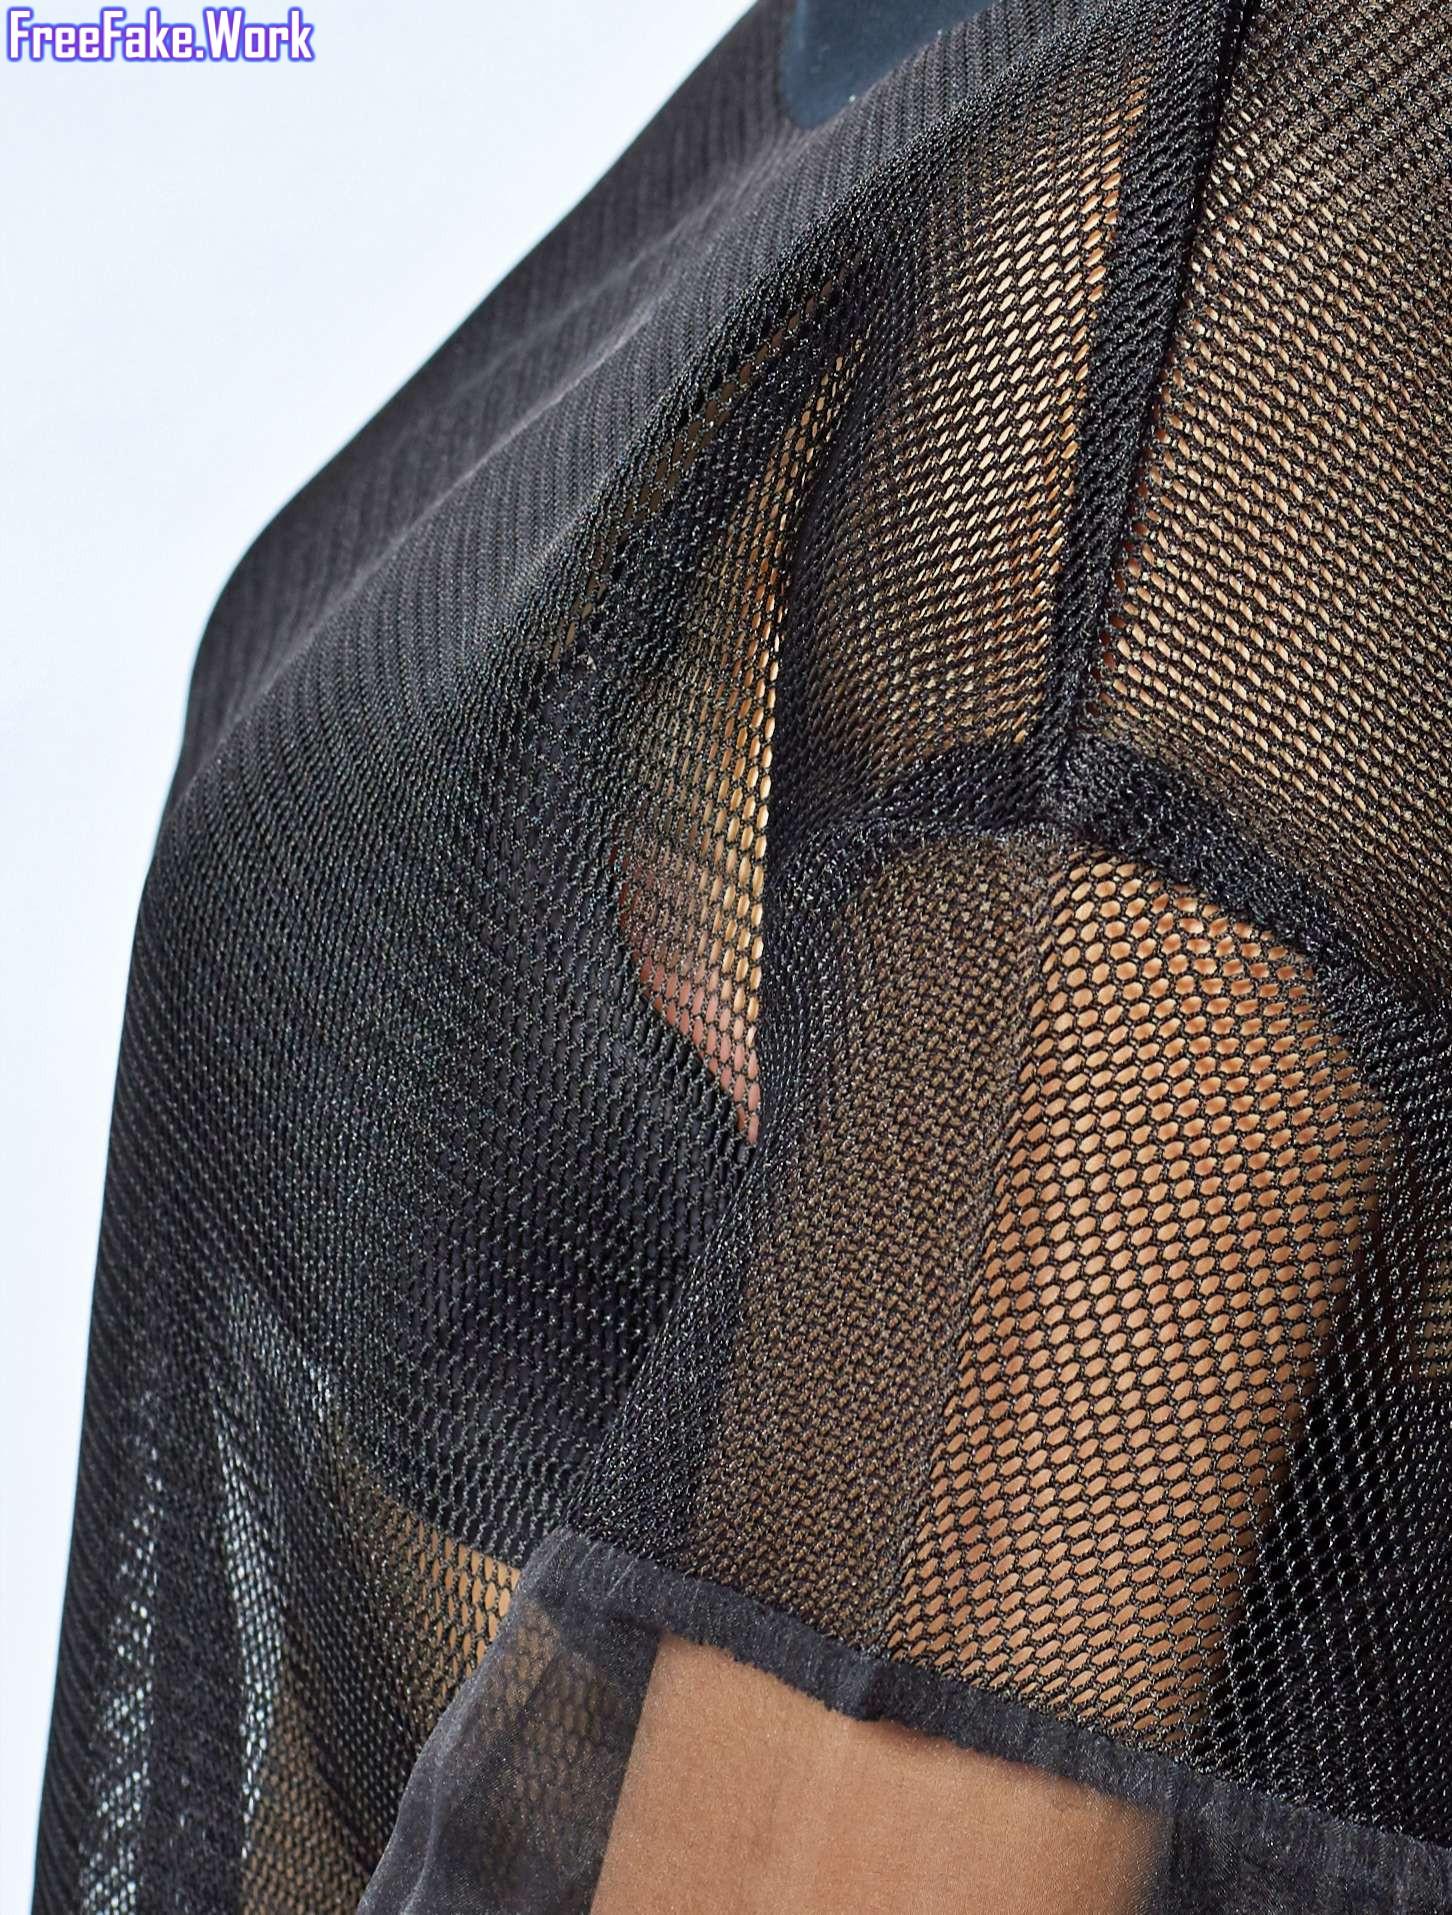 Mithila-Palkar-black-bra-fishnet-top-xxx-3.jpg